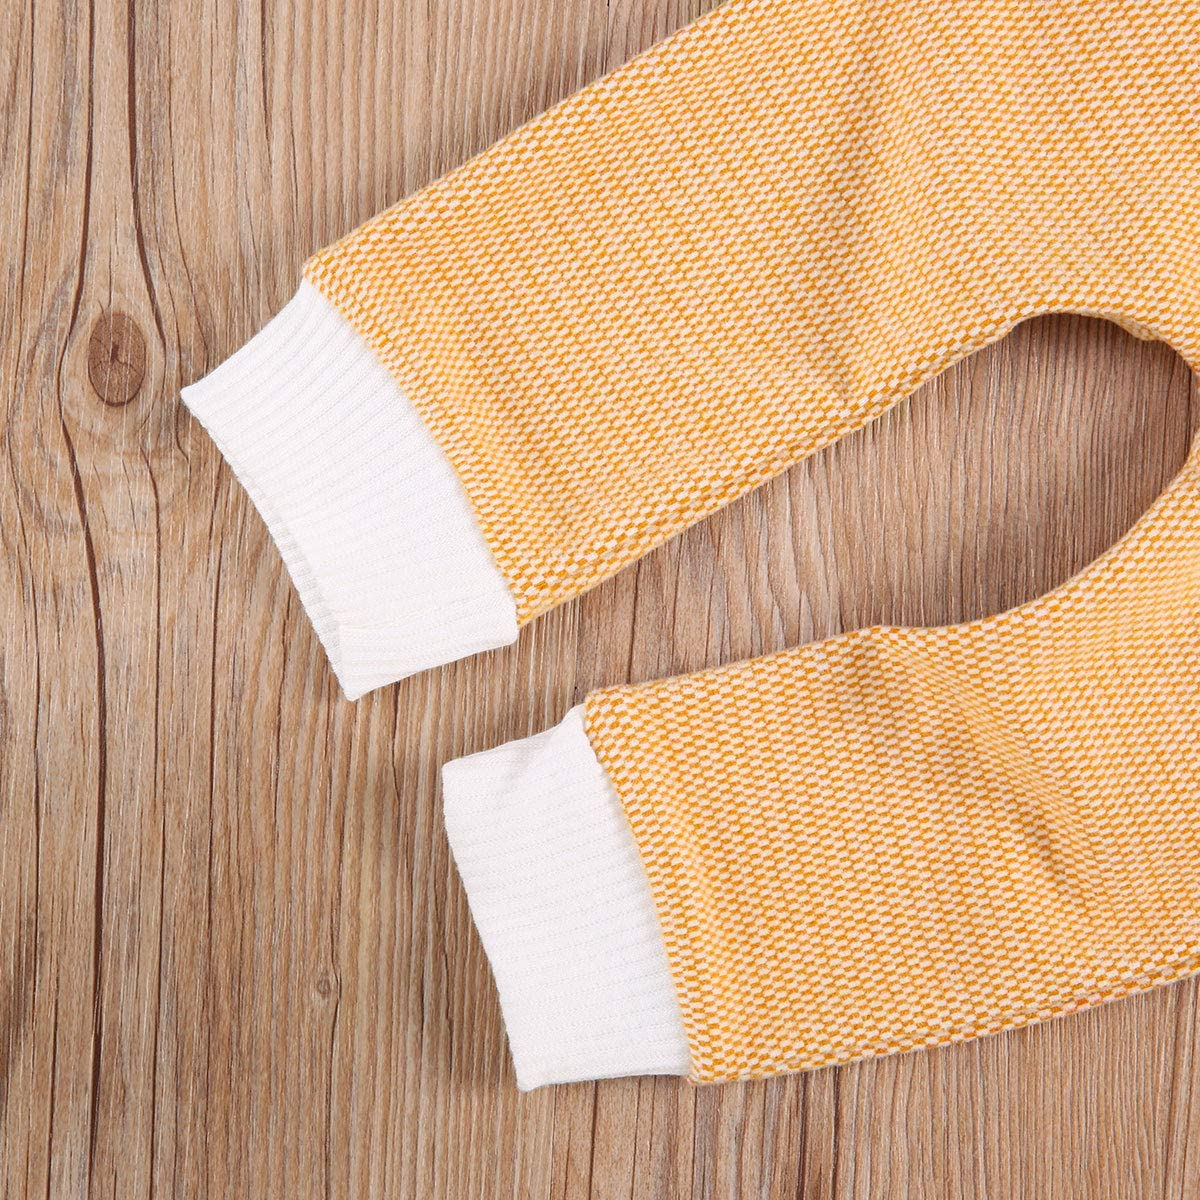 Long Sleeve Tops /& Pants 2 Piece PJ Set Organic Cotton Clothing Set for Infant Baby Boys Girls Baby Unisex Pajamas